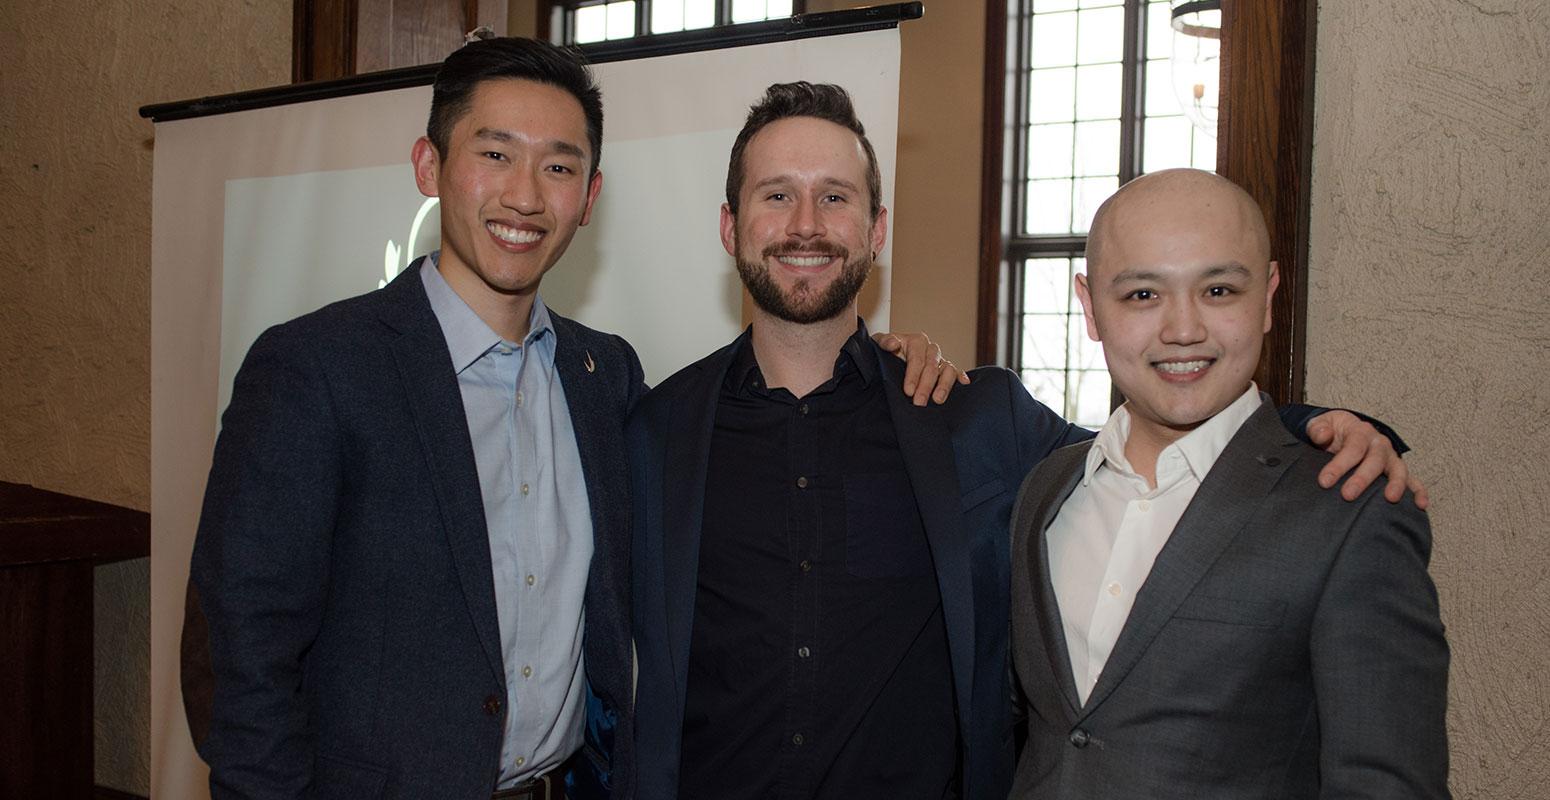 Michael Wong, Tim Han, Joshua Dierworlf